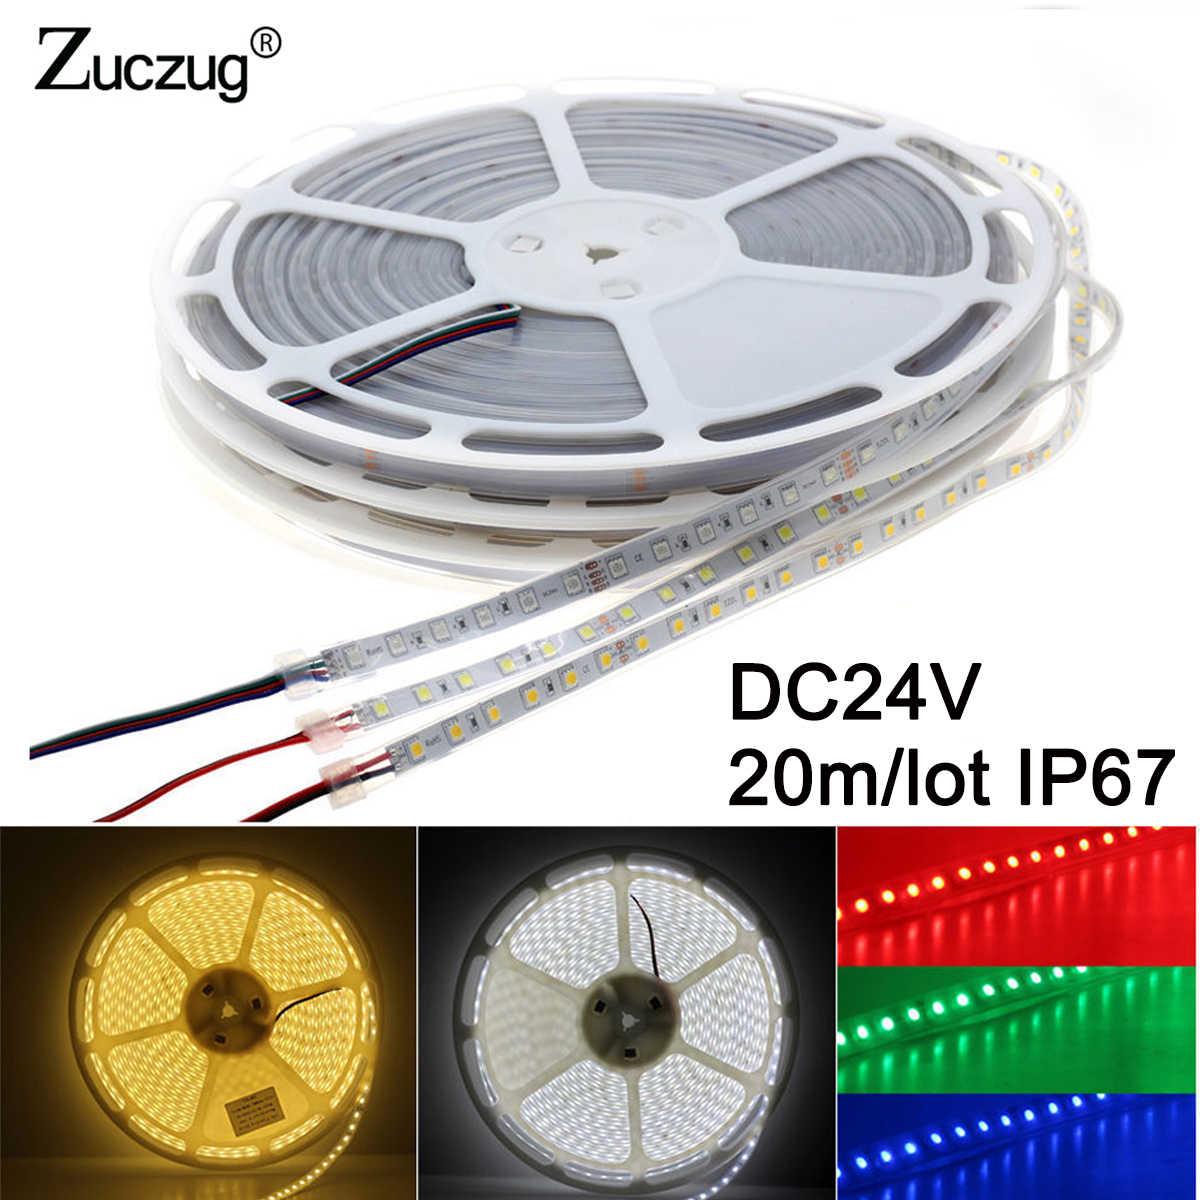 DC 24 V 20 M Lampu LED Strip 5050 24 V Volt Silikon Tabung Tahan Air IP67 1200led Keren Putih Hangat putih RGB Flexible Tape Ledstrip